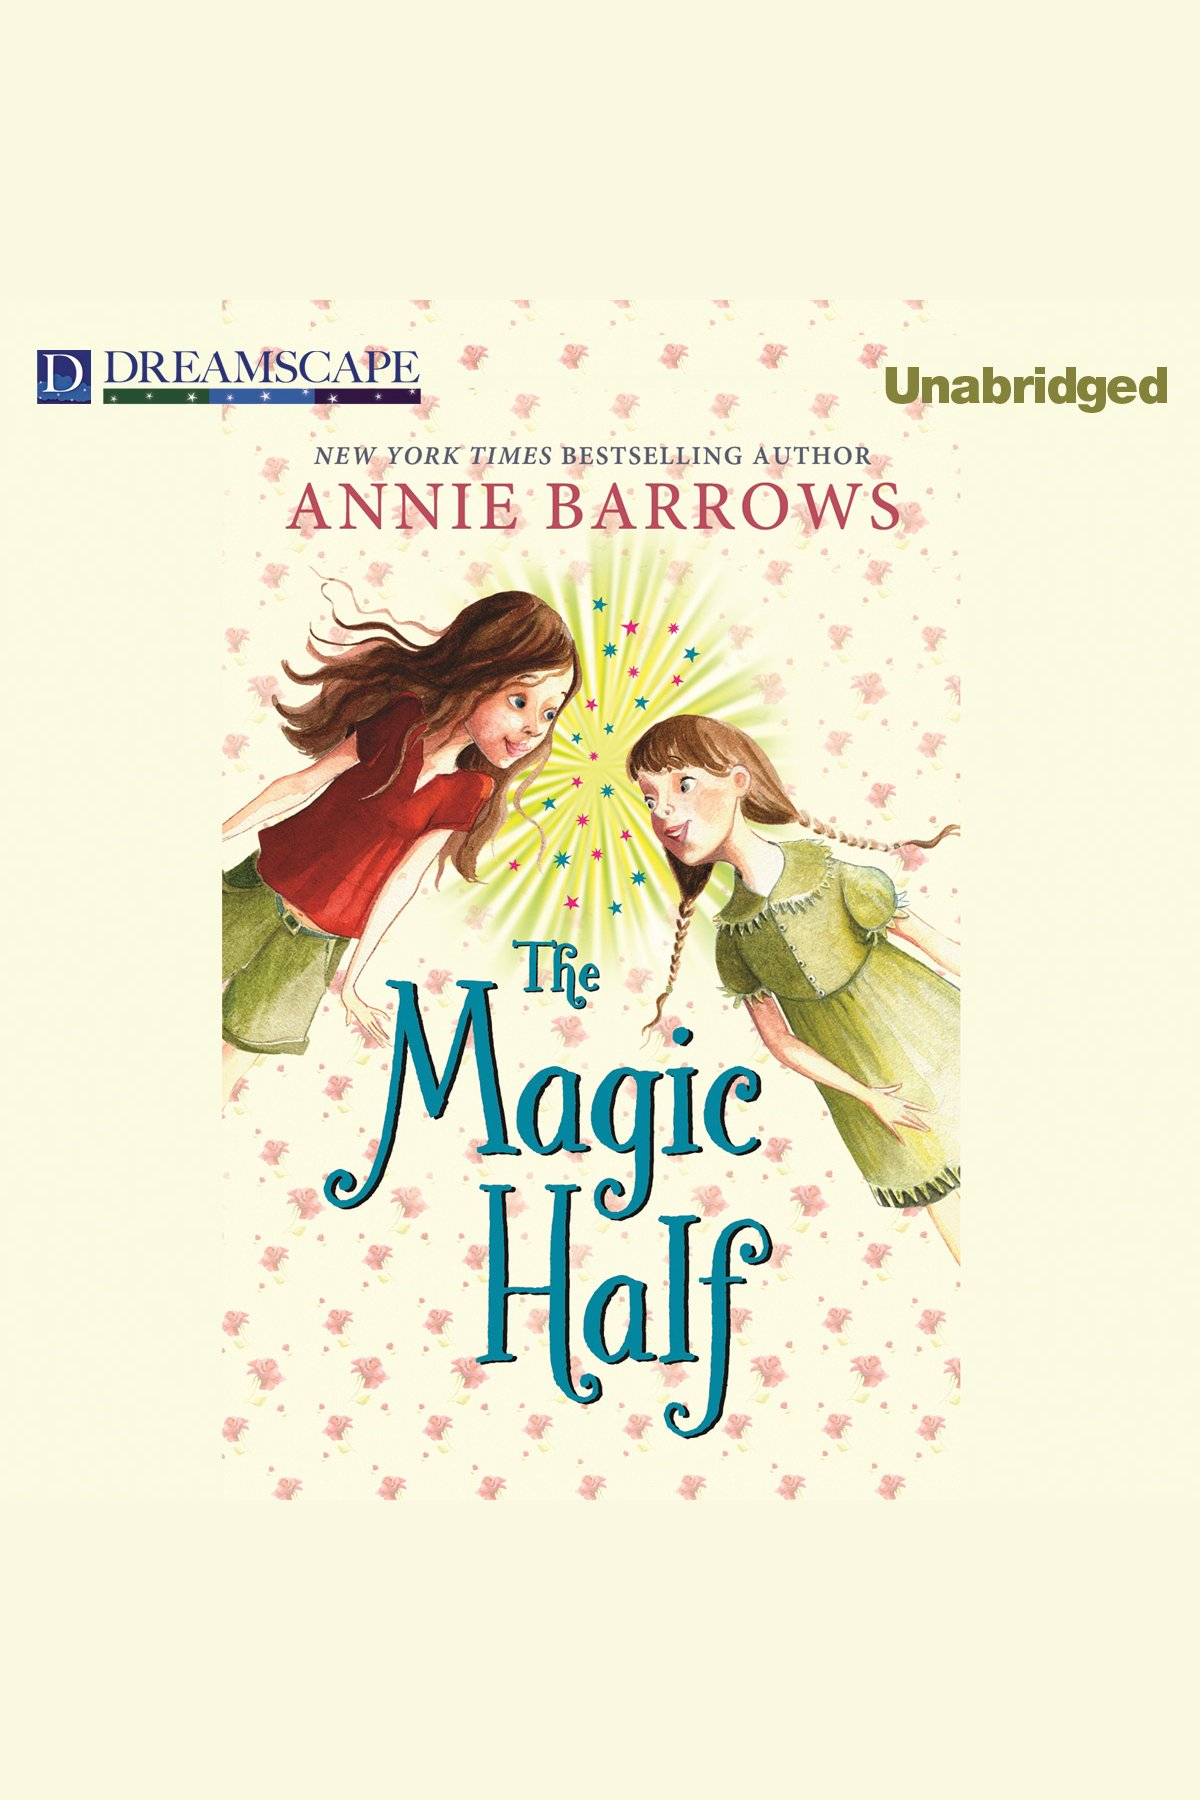 The magic half cover image